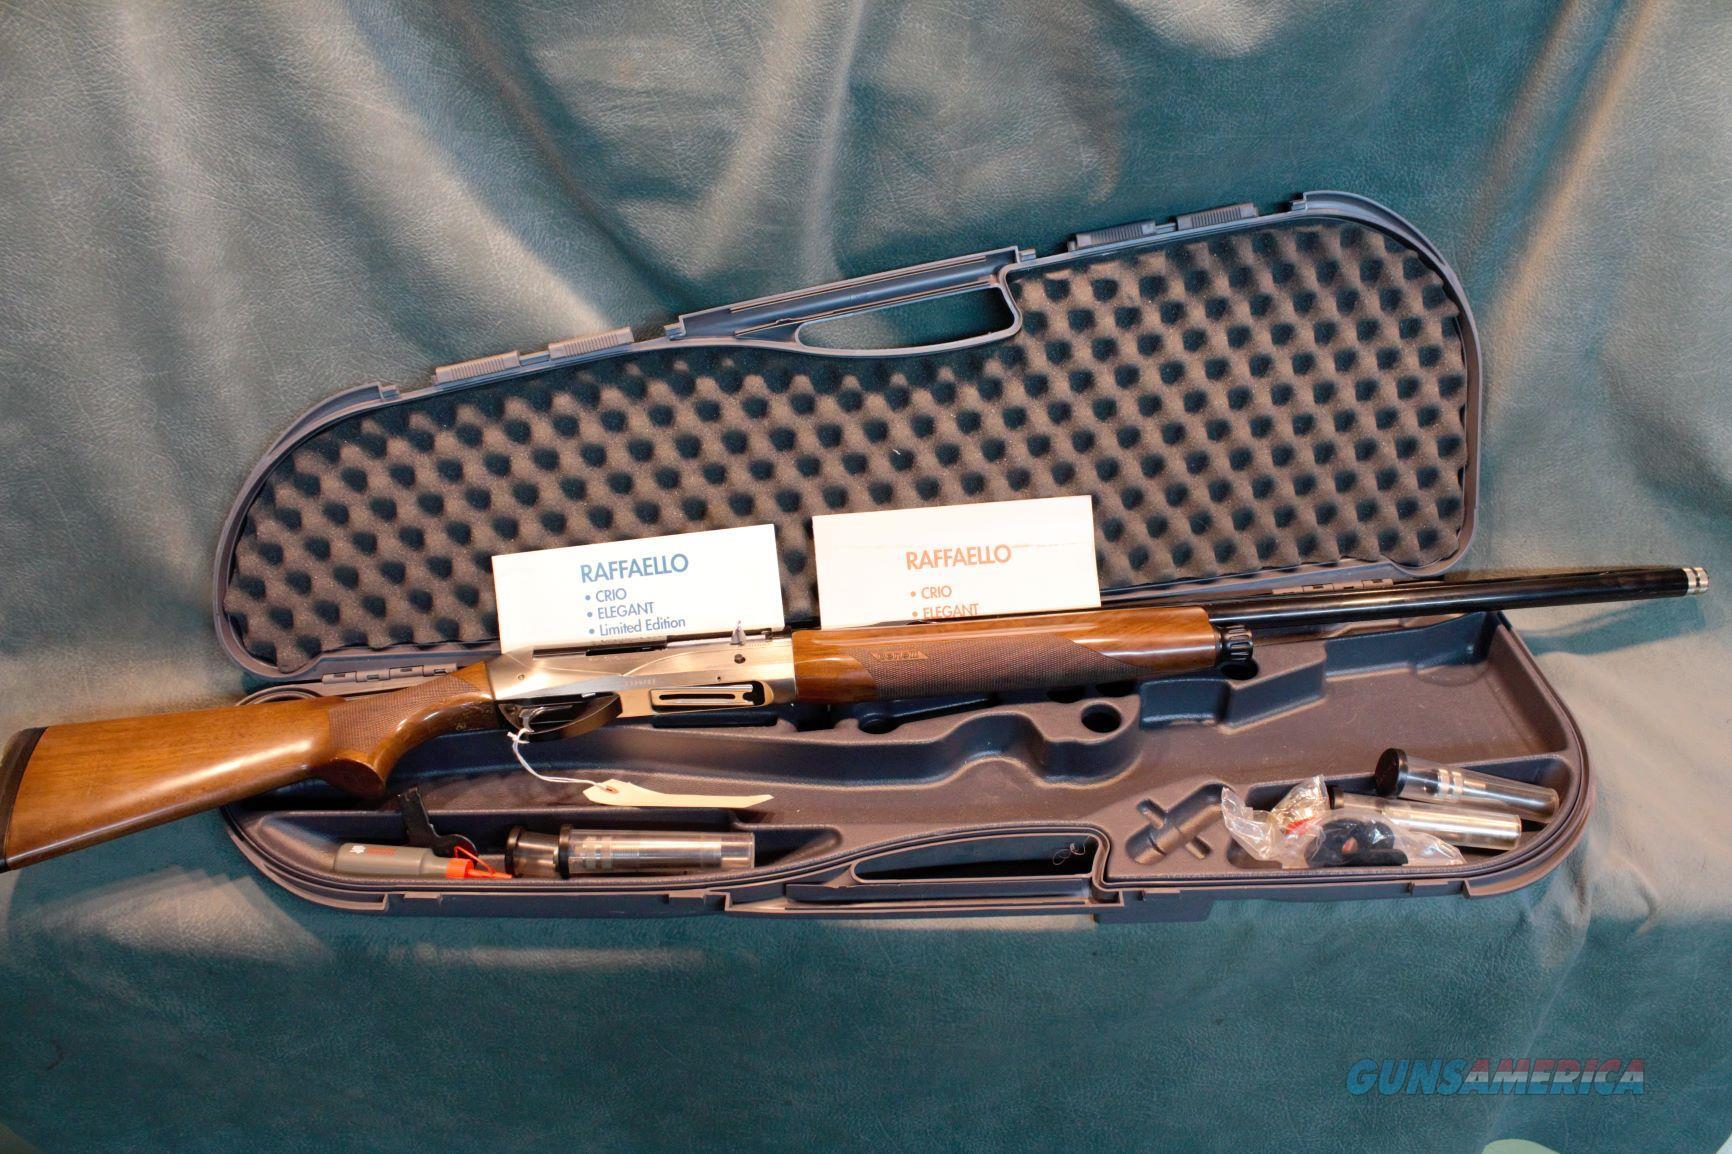 Benelli Sport II 12 gauge  Guns > Shotguns > Benelli Shotguns > Sporting